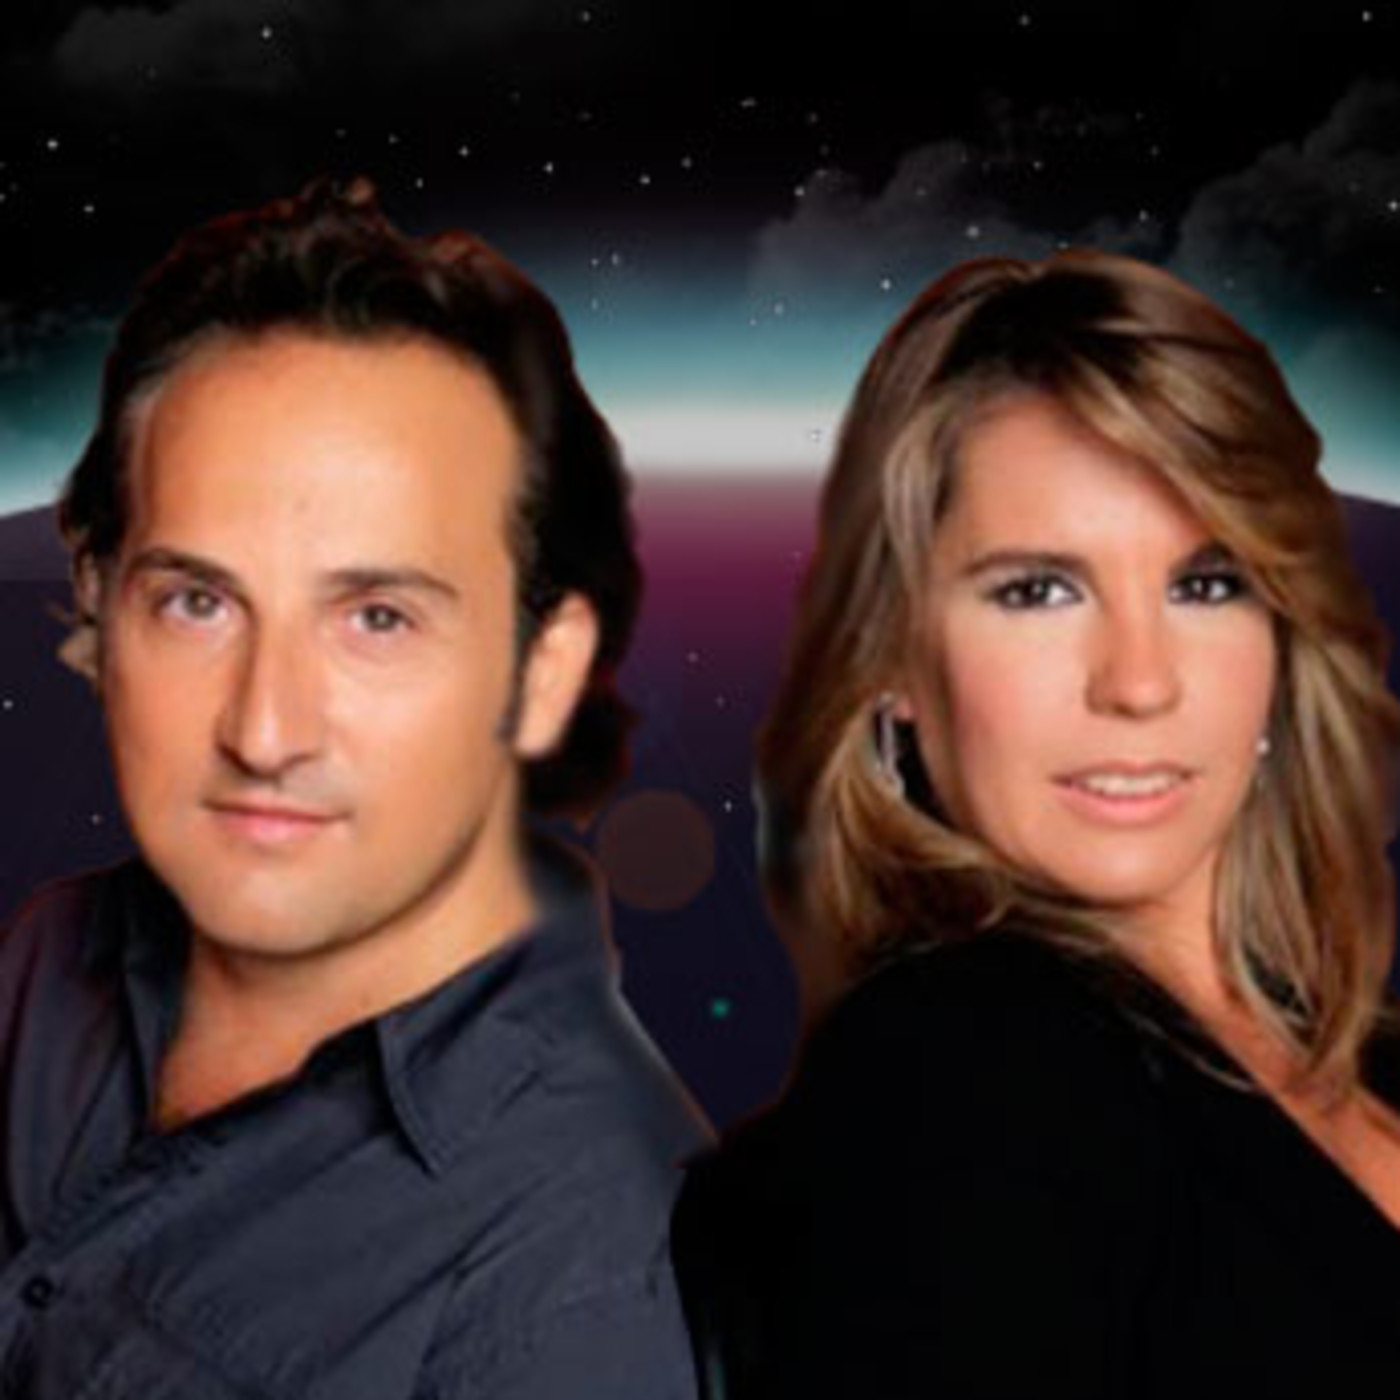 Universo Iker T2x37 - 'Dos en la noche: el enigma del ciberataque masivo'